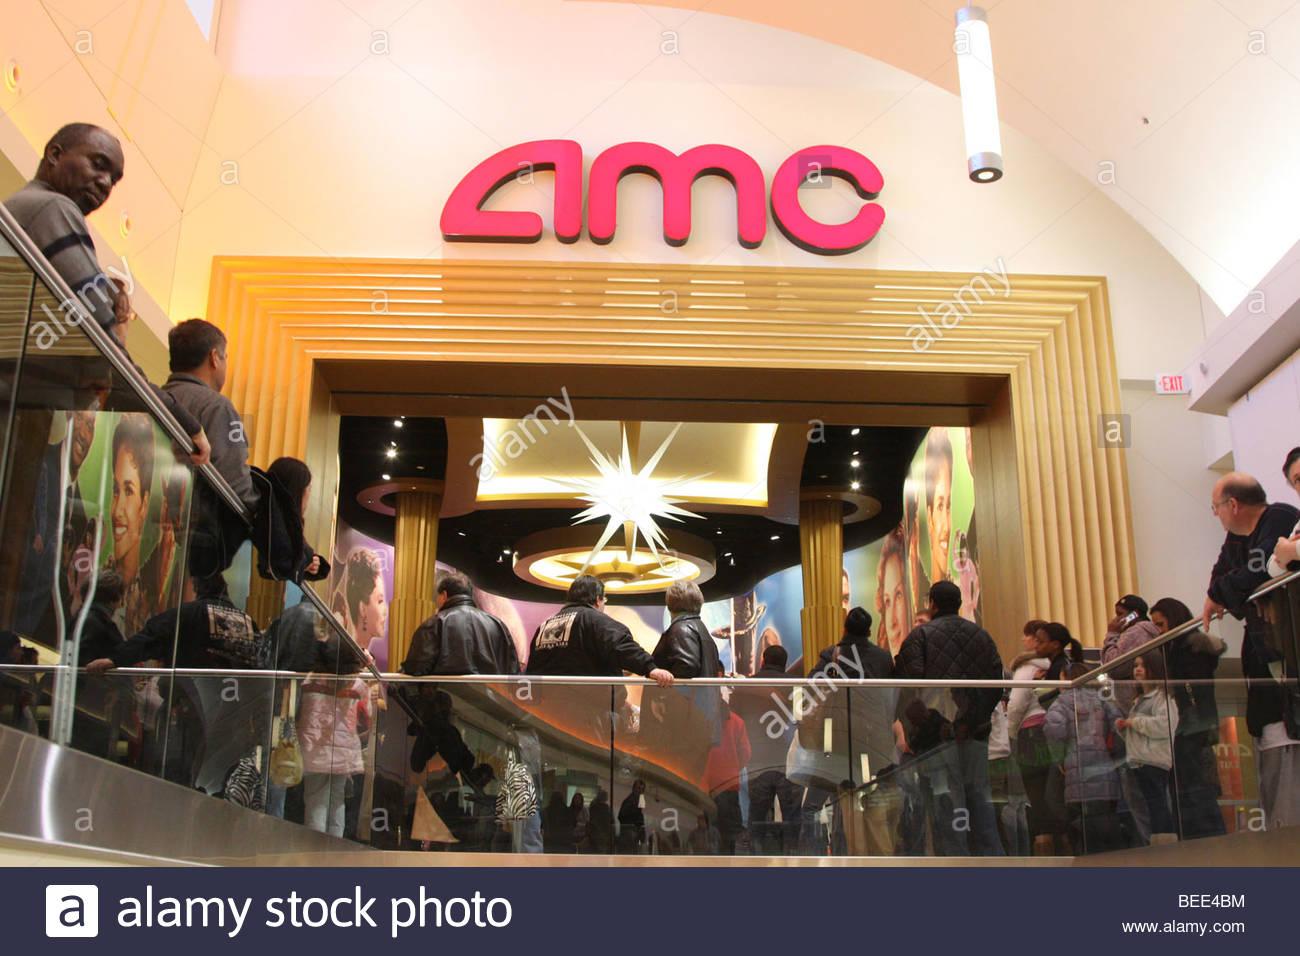 Movie Theater Crowd Stock Photos Movie Theater Crowd Stock Images Alamy